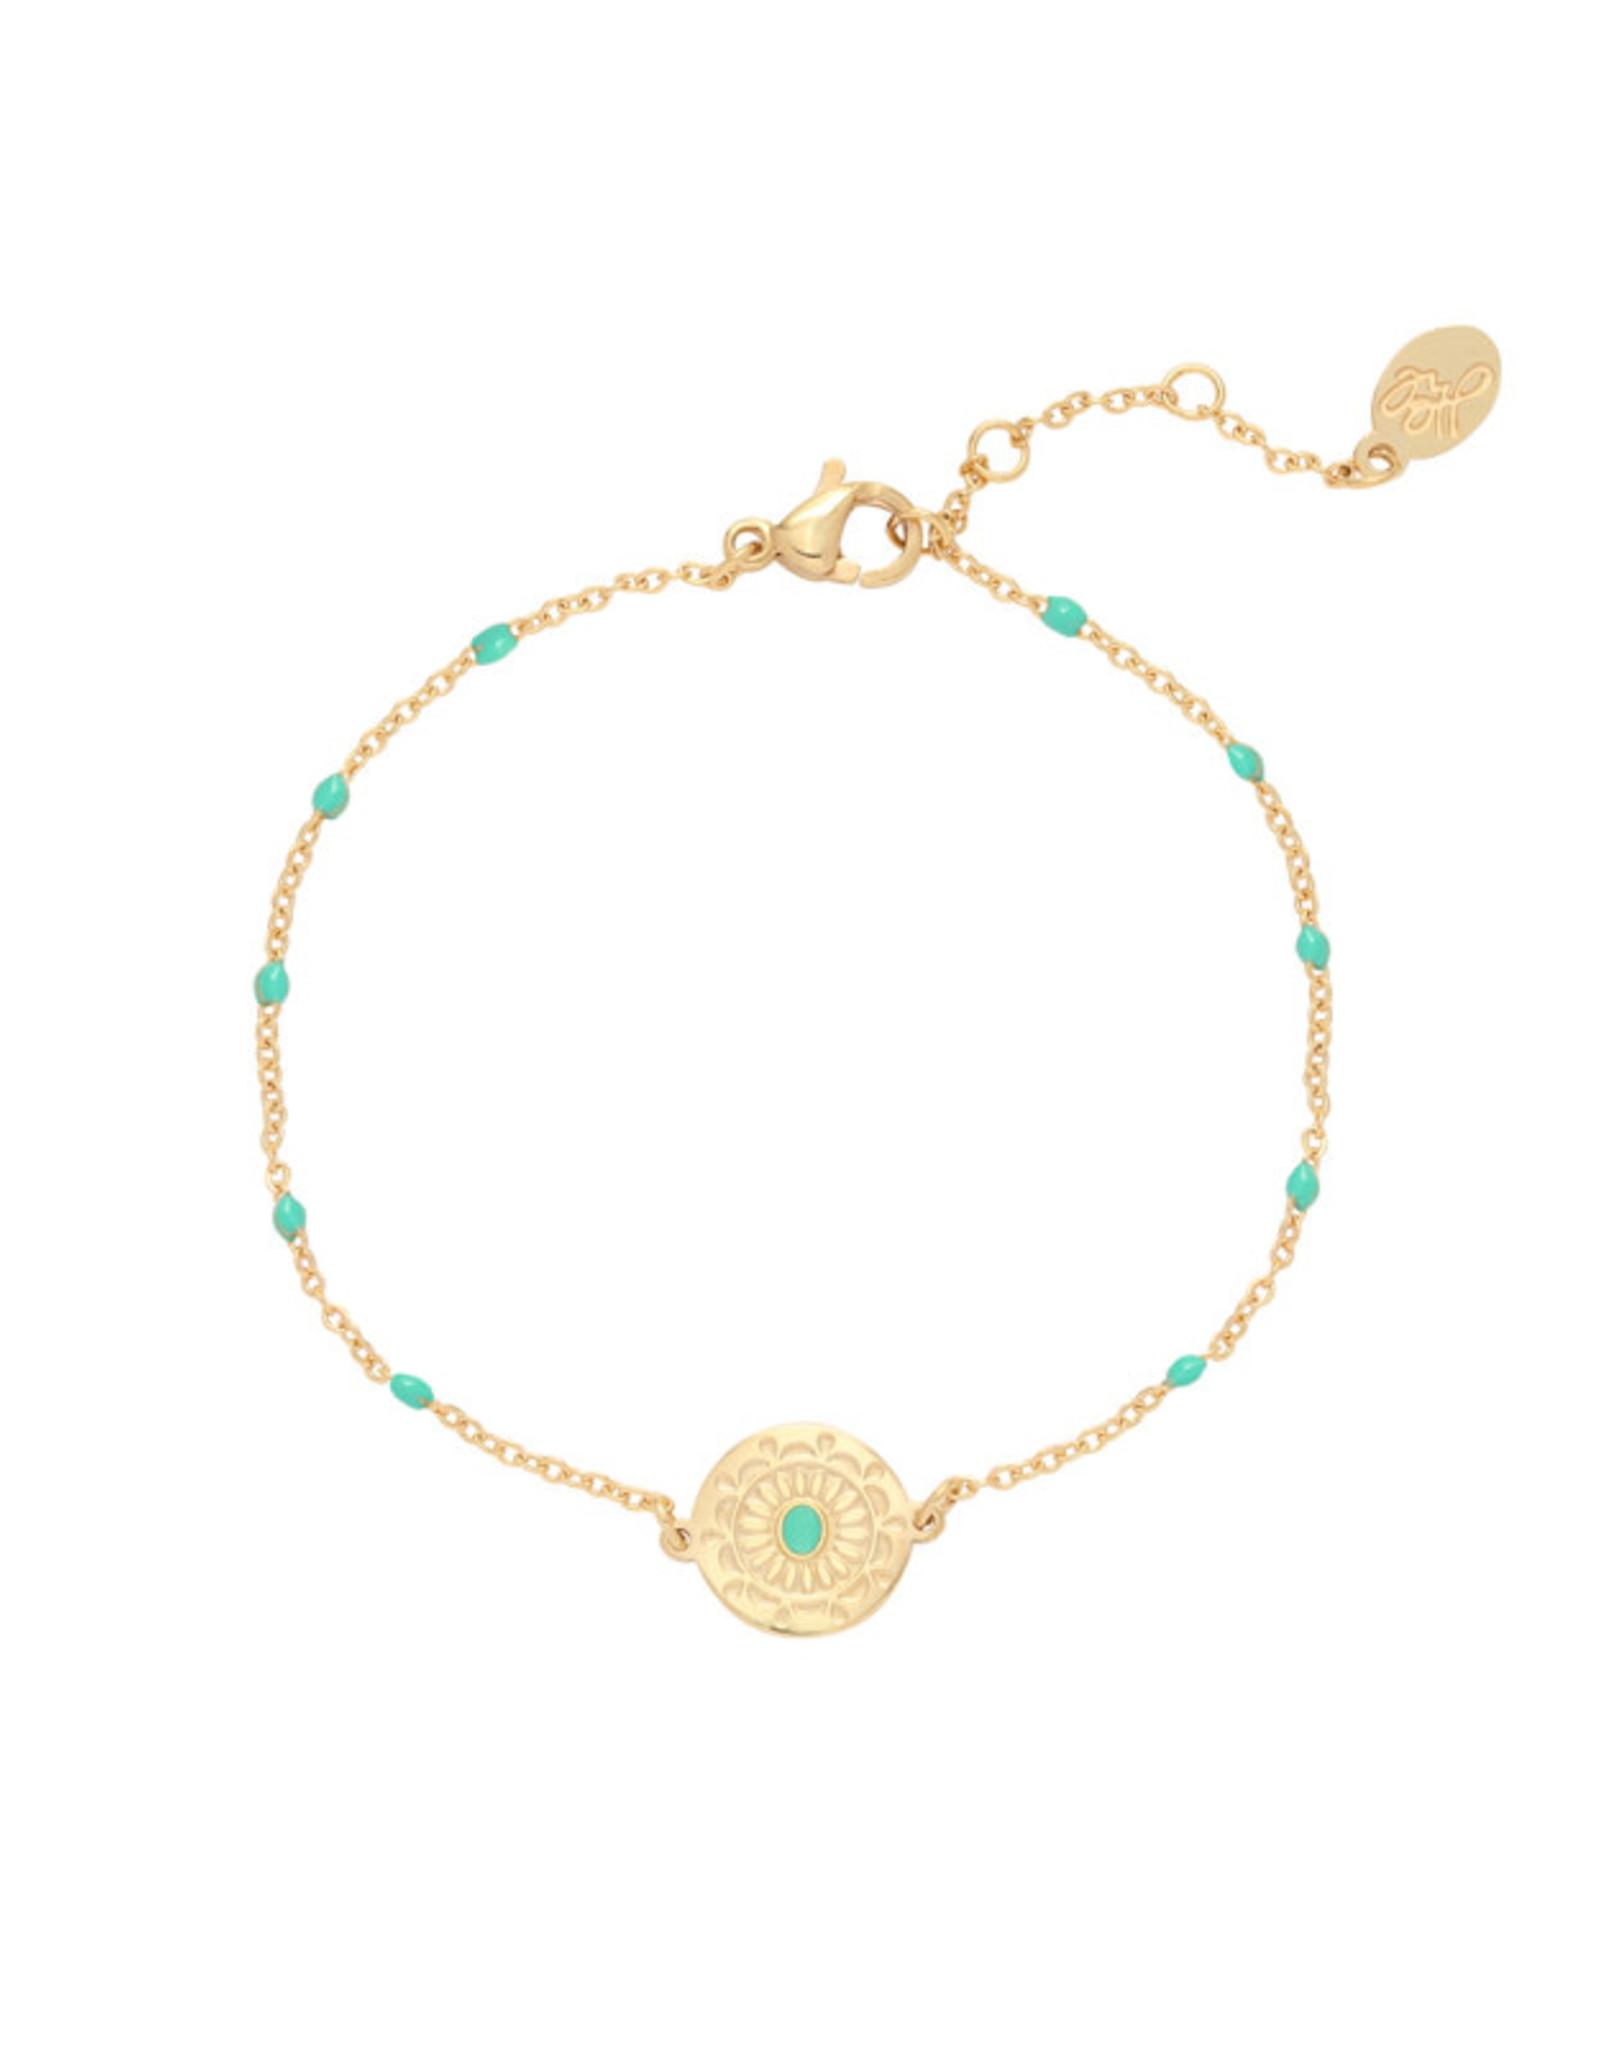 Bracelet deco coin turquoise